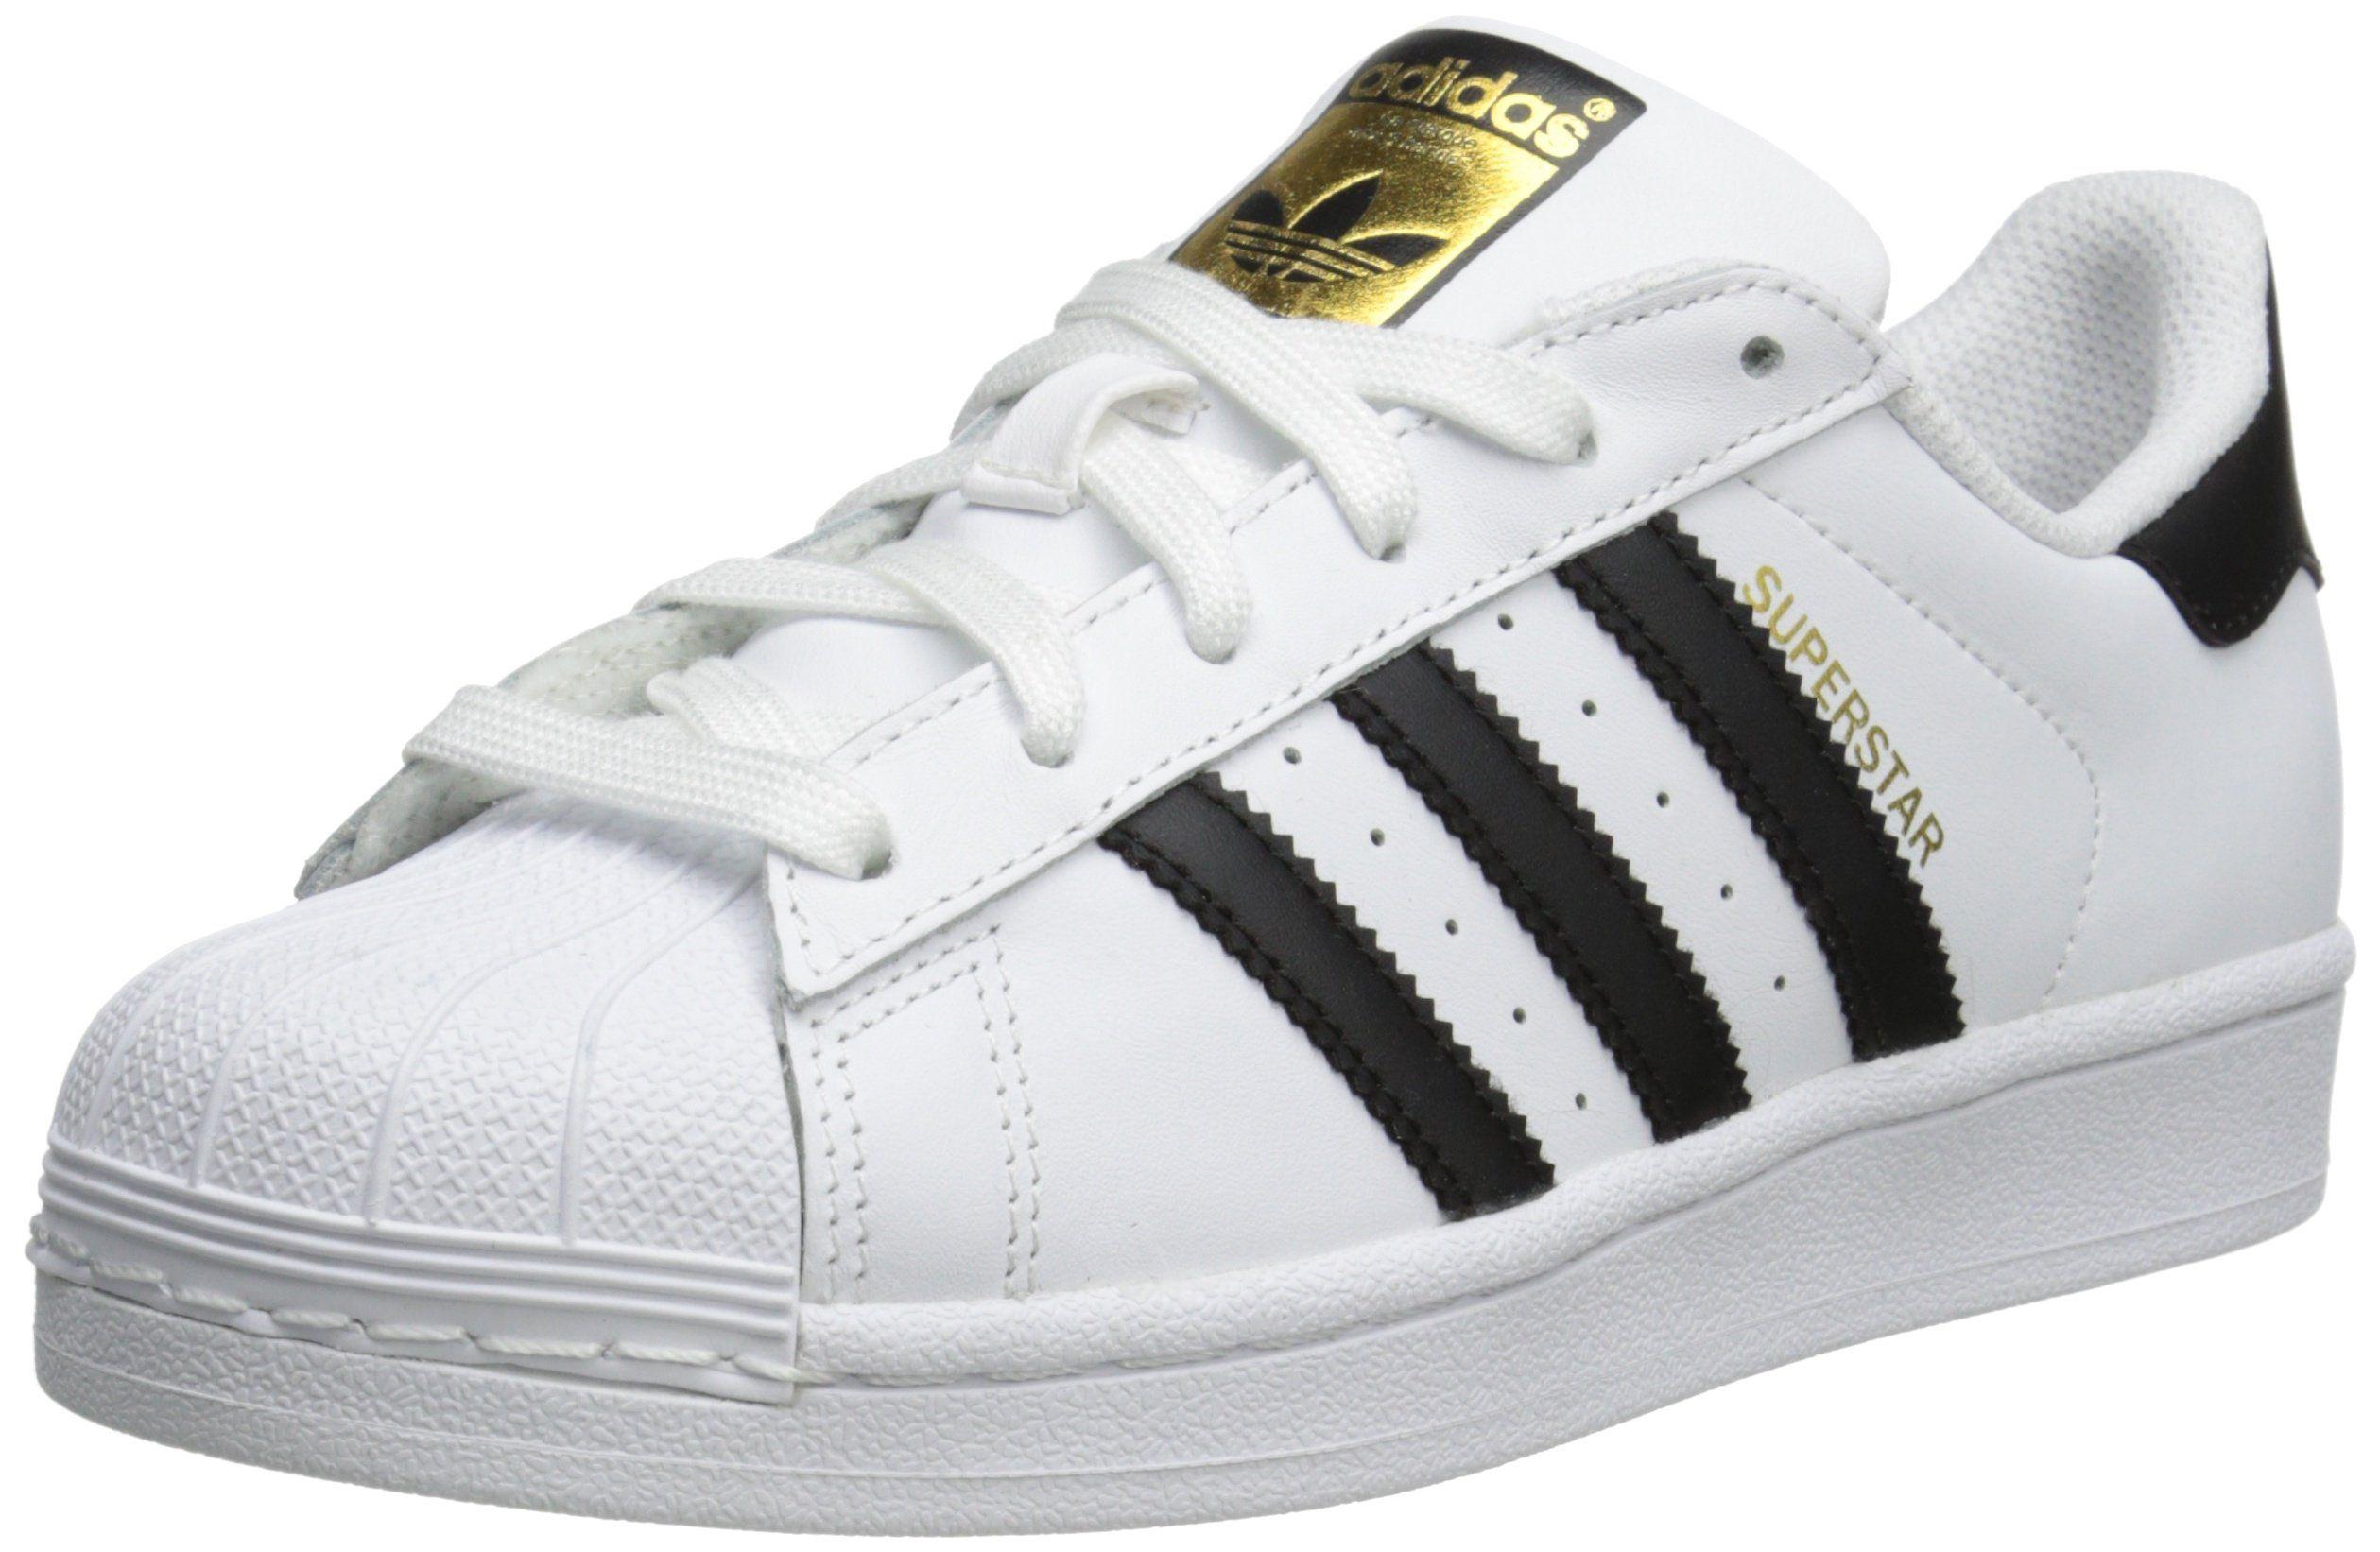 Originals Sneakerbig Low Casual Cut Adidas Superstar J Basketball VpqSUzMG